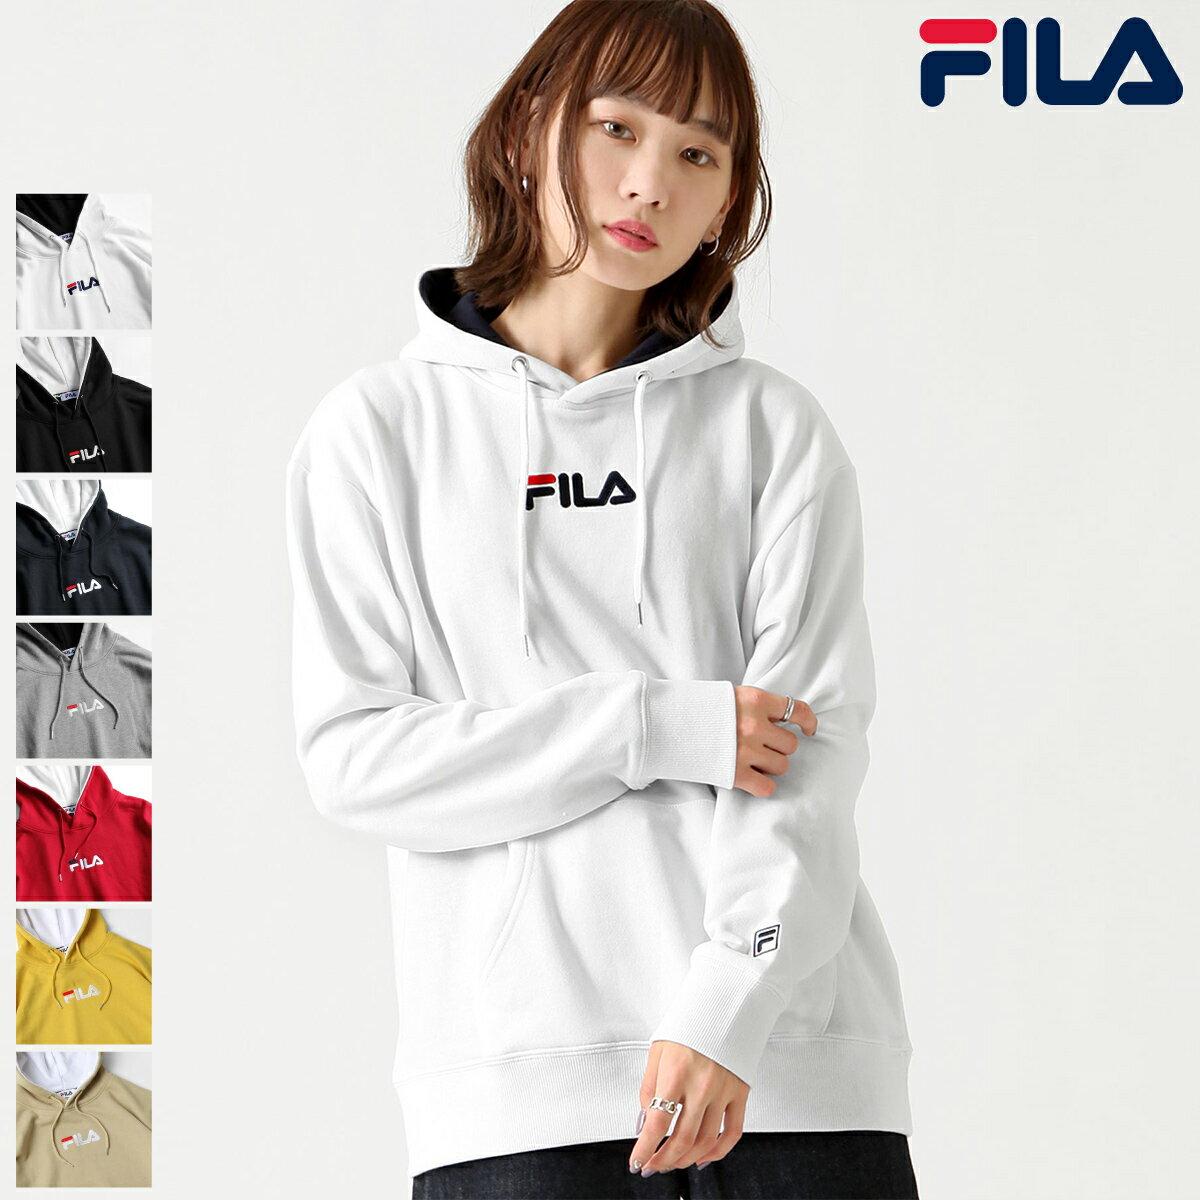 【FILA】單點LOGO刺繡連帽T恤 0